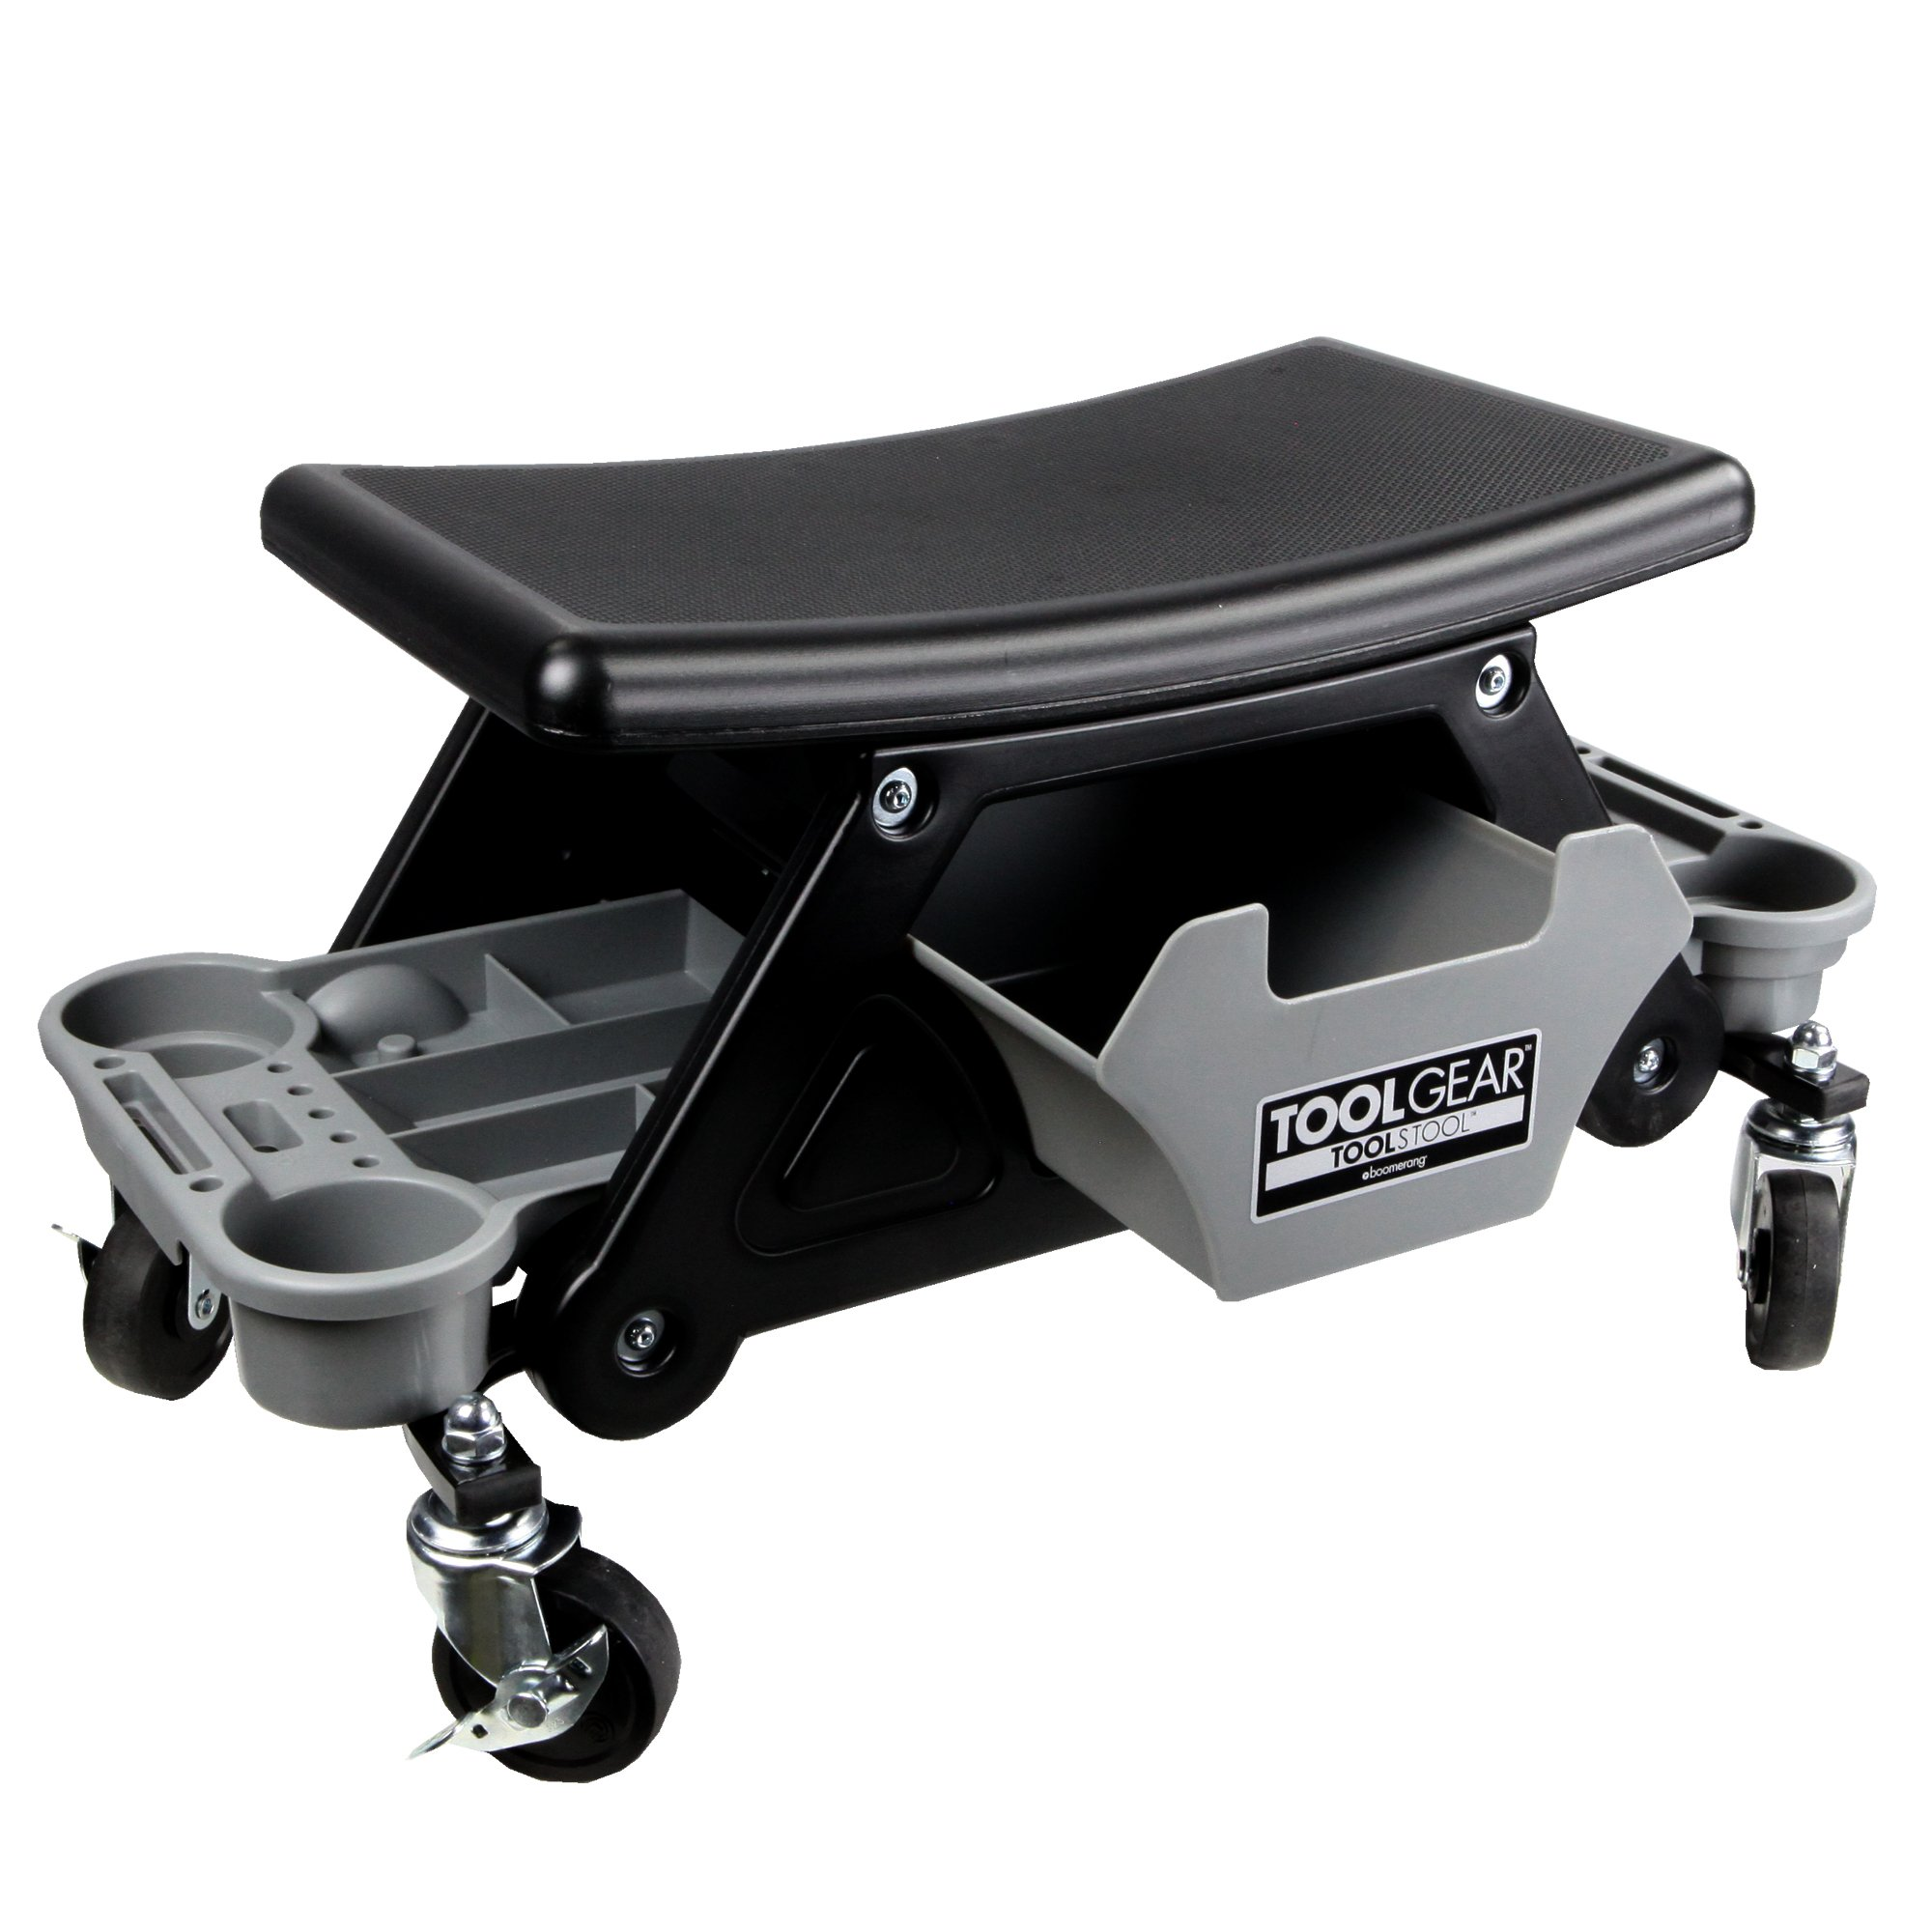 Boomerang ToolStool Roller-Seat Shop-Cart by Boomerang (Image #4)